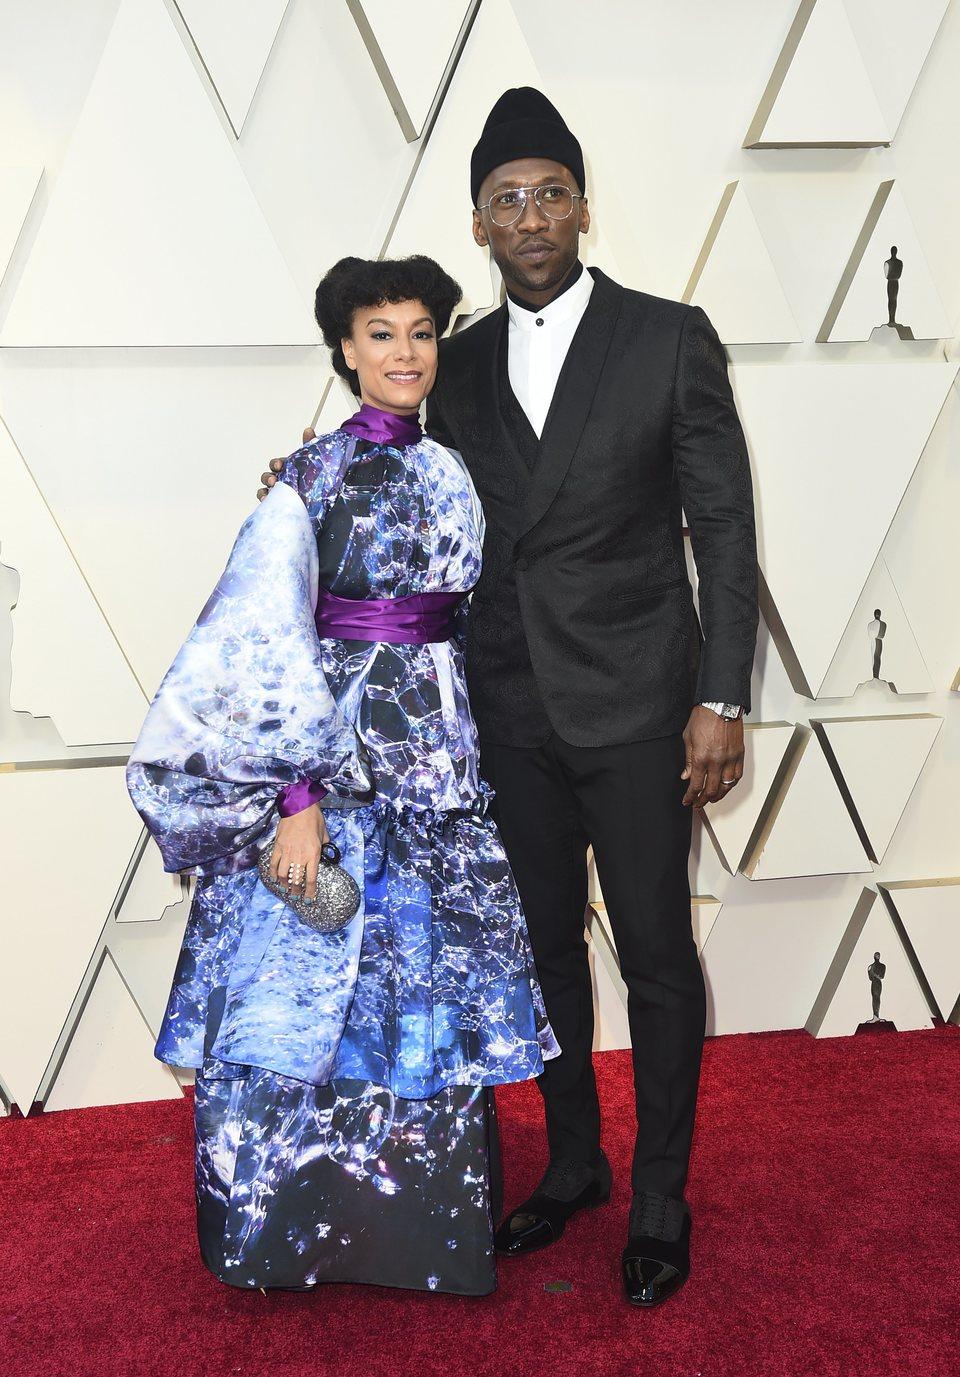 Mahershala Ali and Amatus Sami-Karim on the red carpet at the Oscars 2019